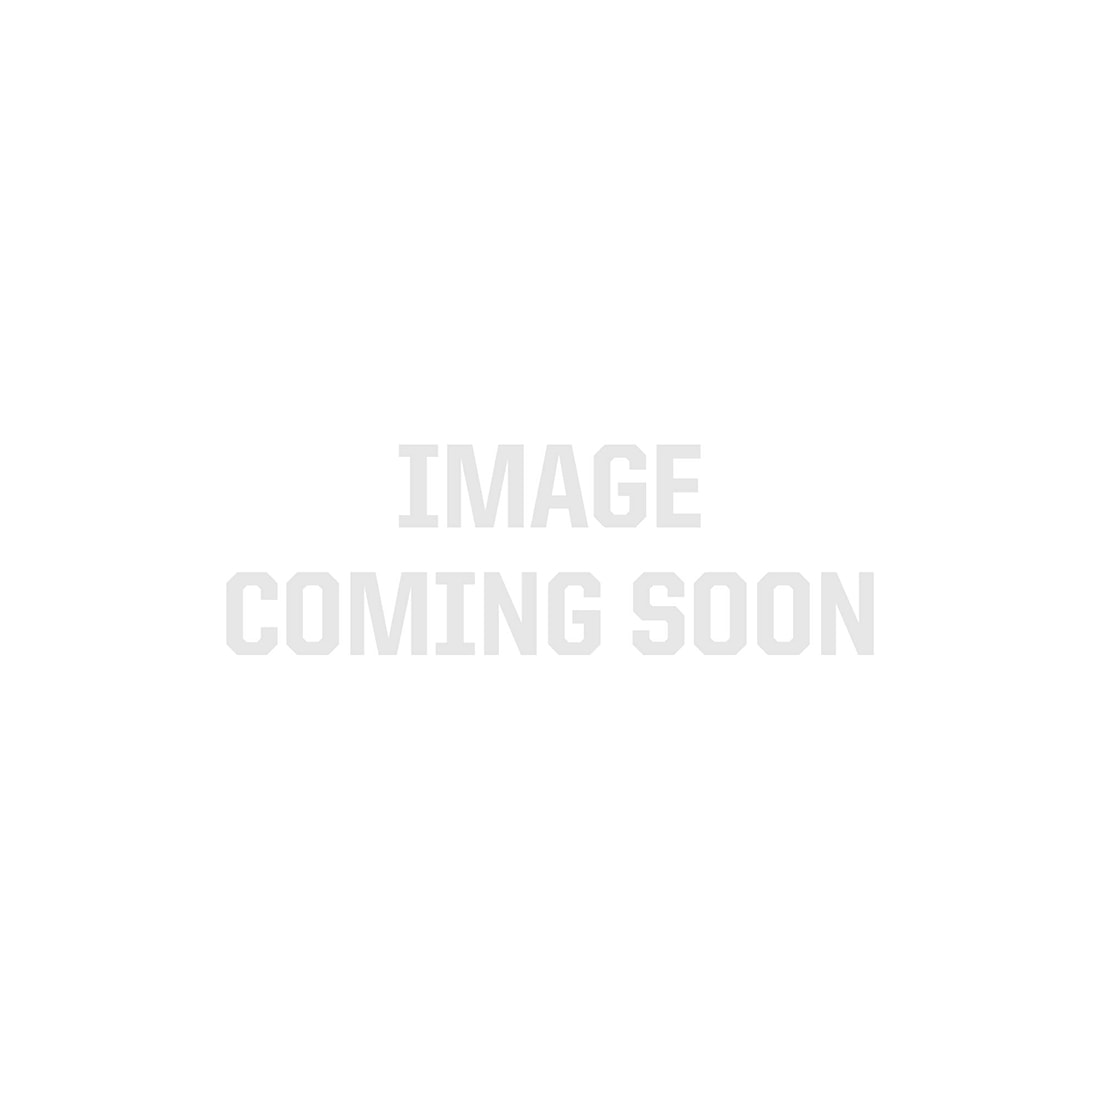 White Adjustable 3528 Quad Row LED Strip Light, 450/m, 28mm wide, Sample Kit